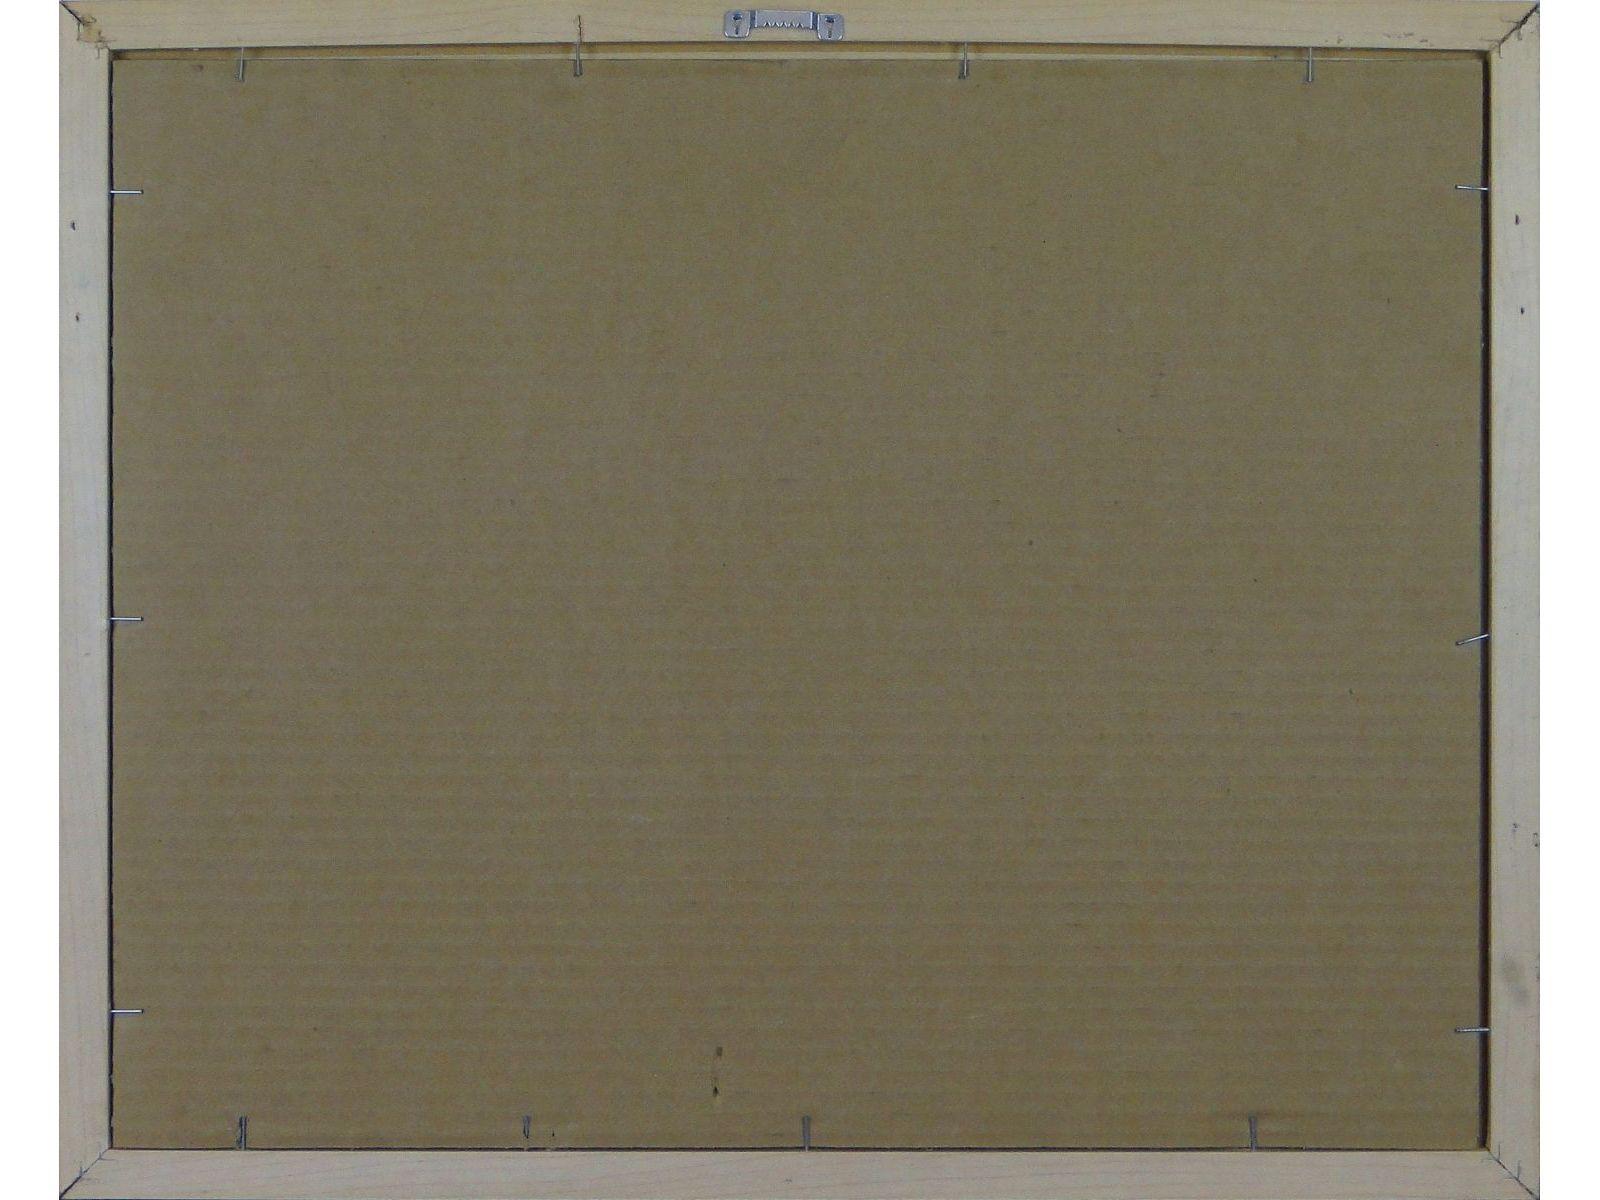 DSC04735.JPG (1600×1200)